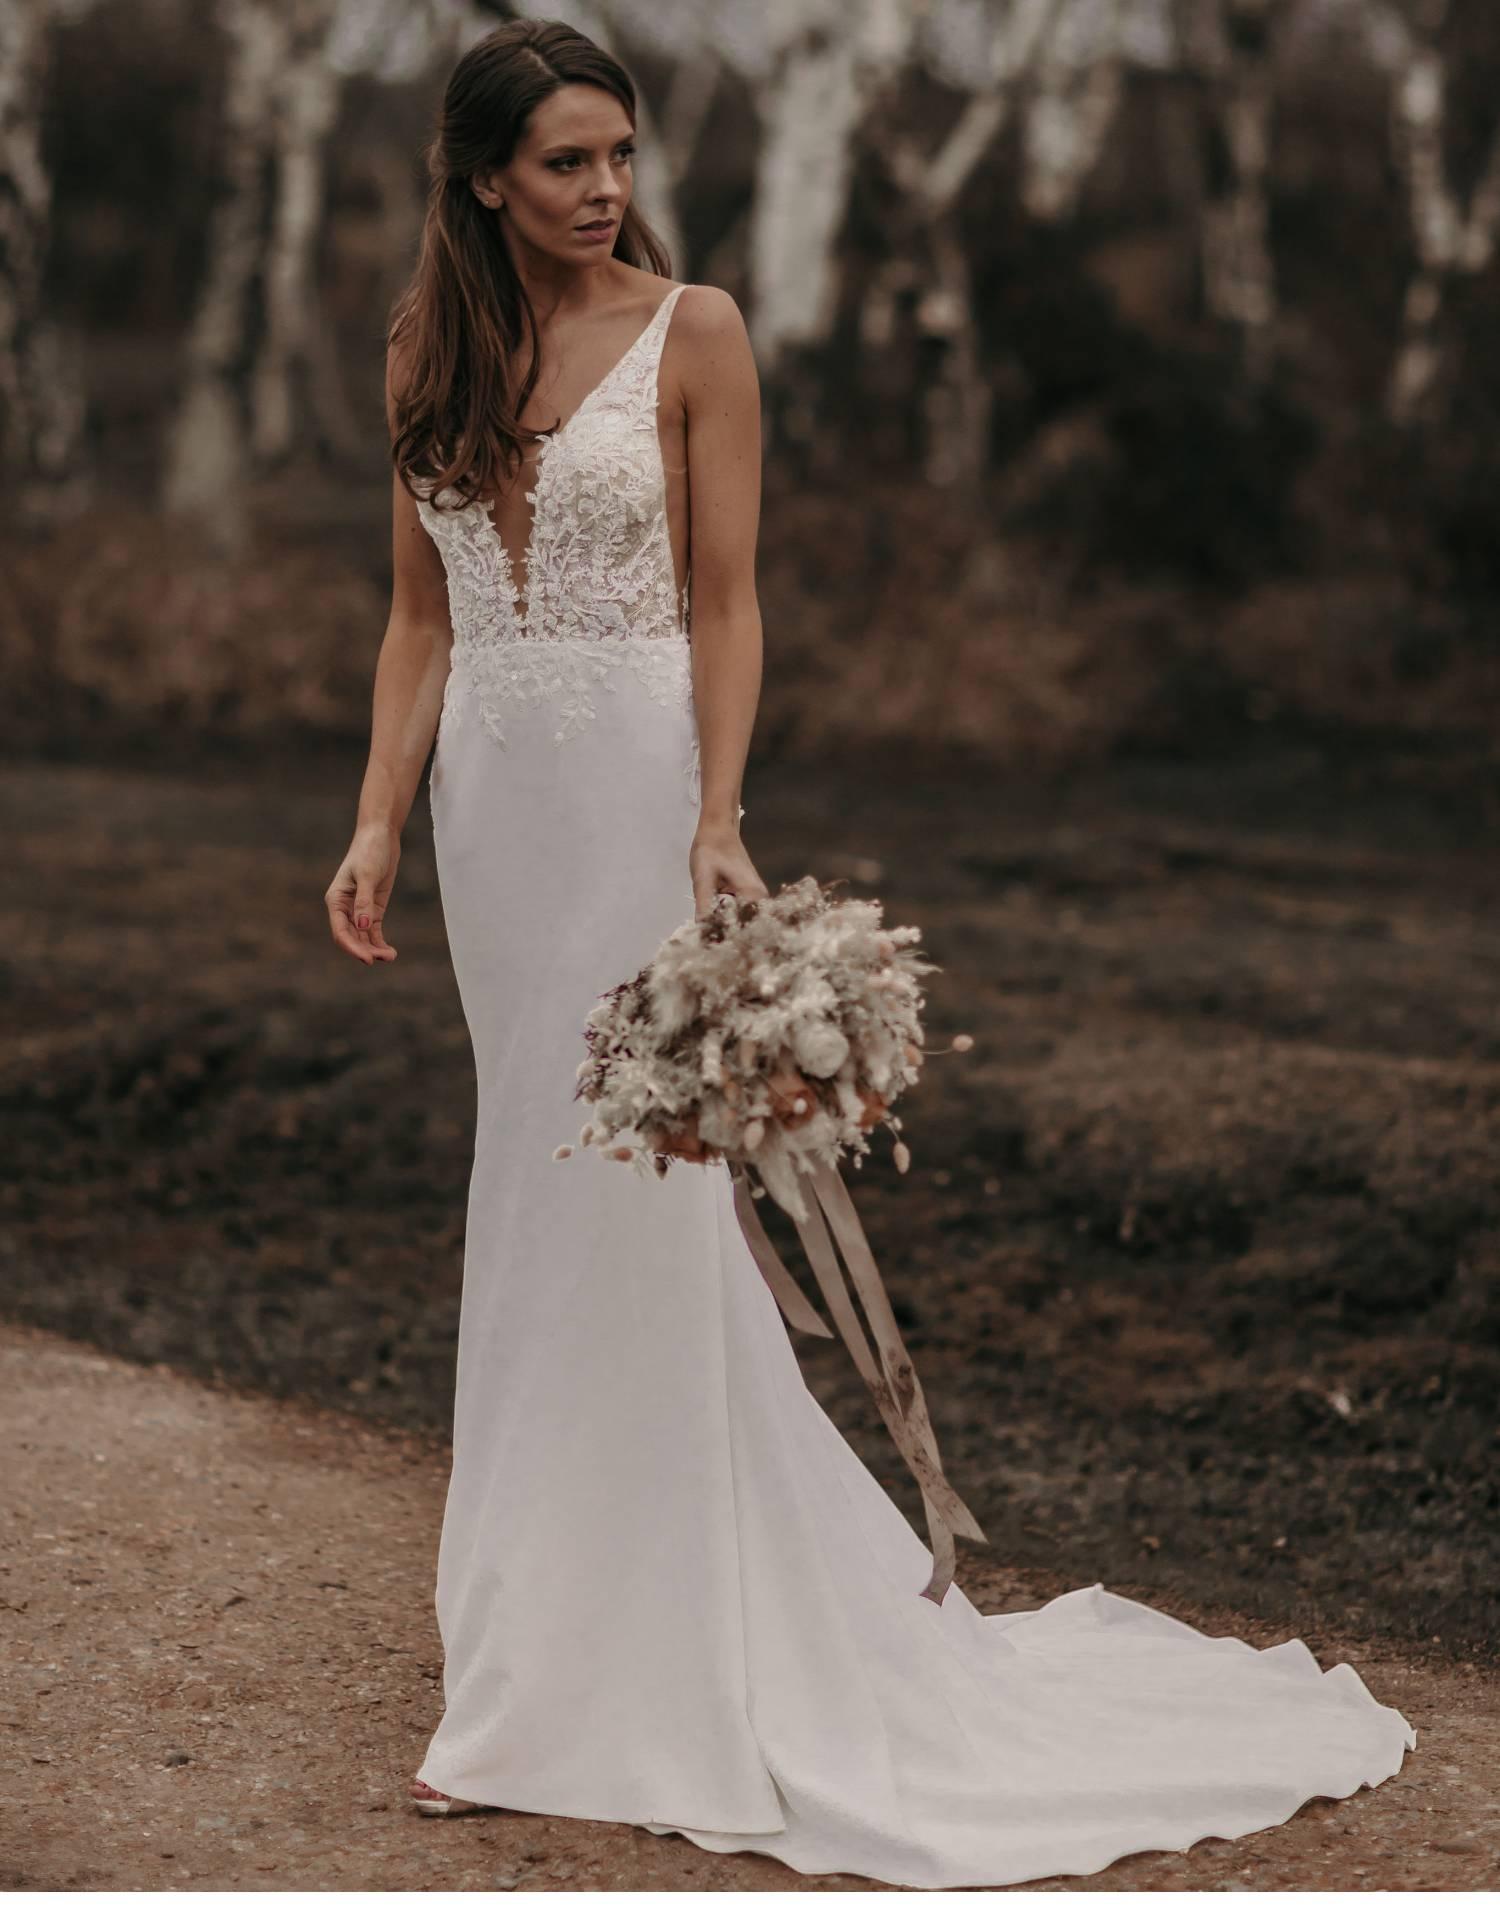 Martlet-wedding-dress-Tiffanys-front-view-min